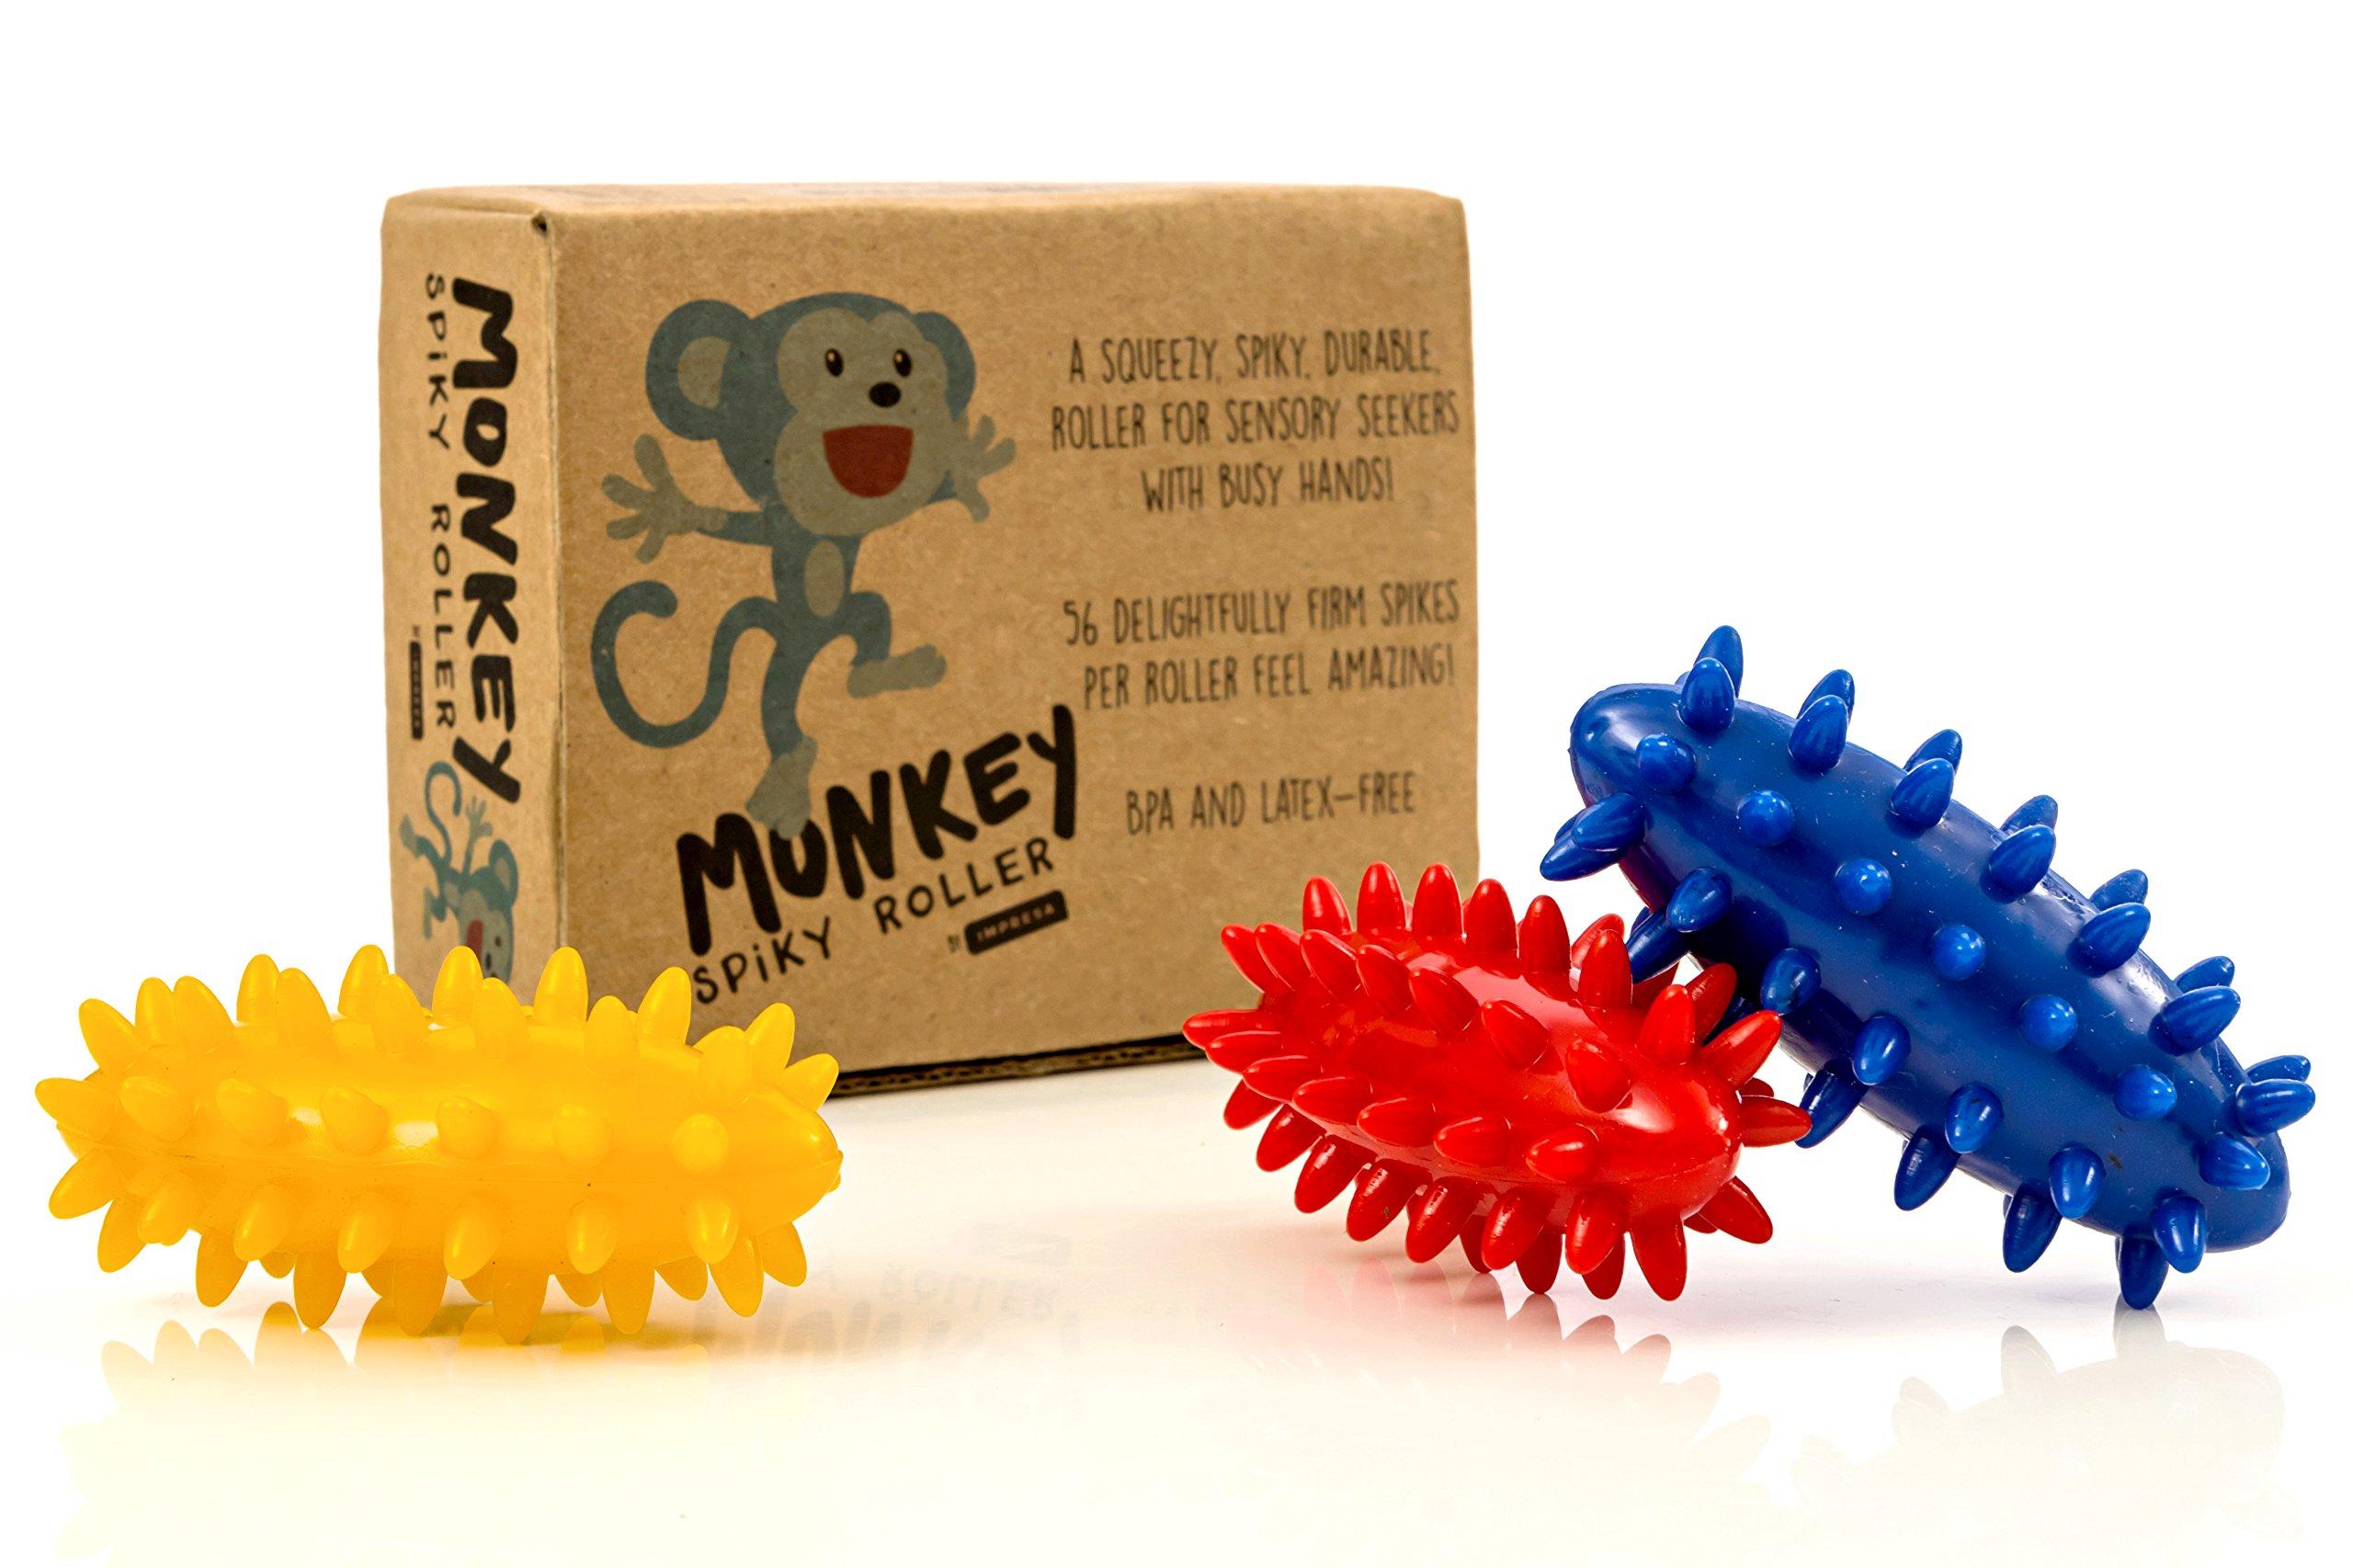 Spiky Sensory Rollers (Pack of 3) - Unbreakable Fidget Toys/Sensory Toy - BPA/Phthalate/Latex-Free - Perfect Monkey Fidgets - by Impresa by Impresa Products